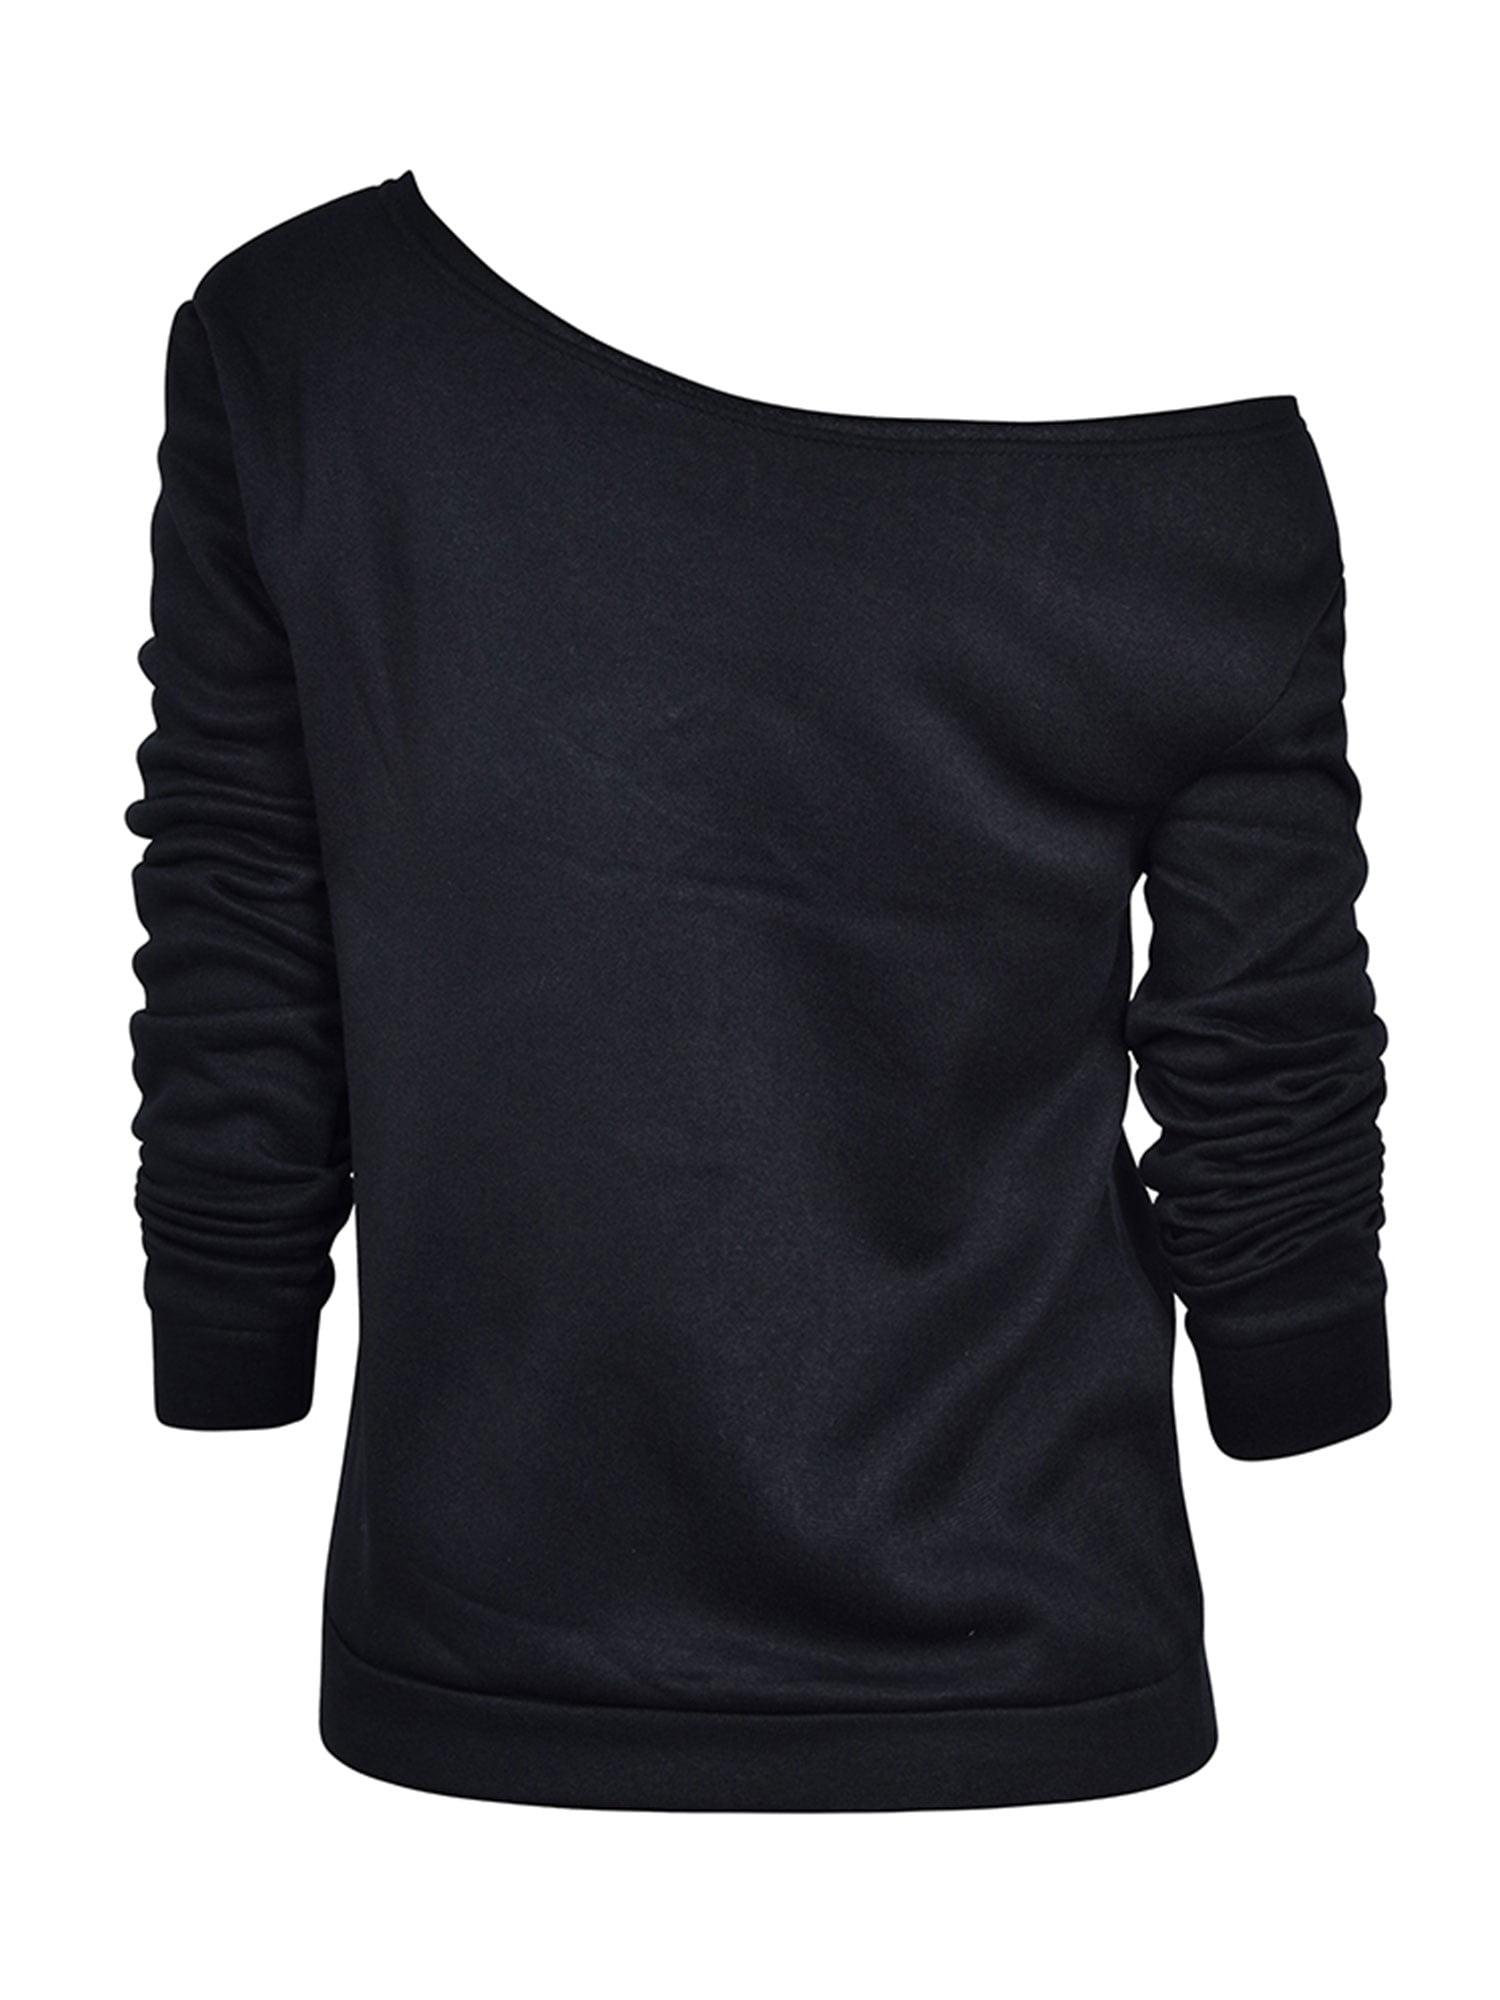 fd69f9f704dd8 HIMONE - Long Sleeve Tops Women Casual Blouse Loose One Off Shoulder Lips  Print T-Shirt Ladies Autumn Baggy Fashion Tee Shirts - Walmart.com